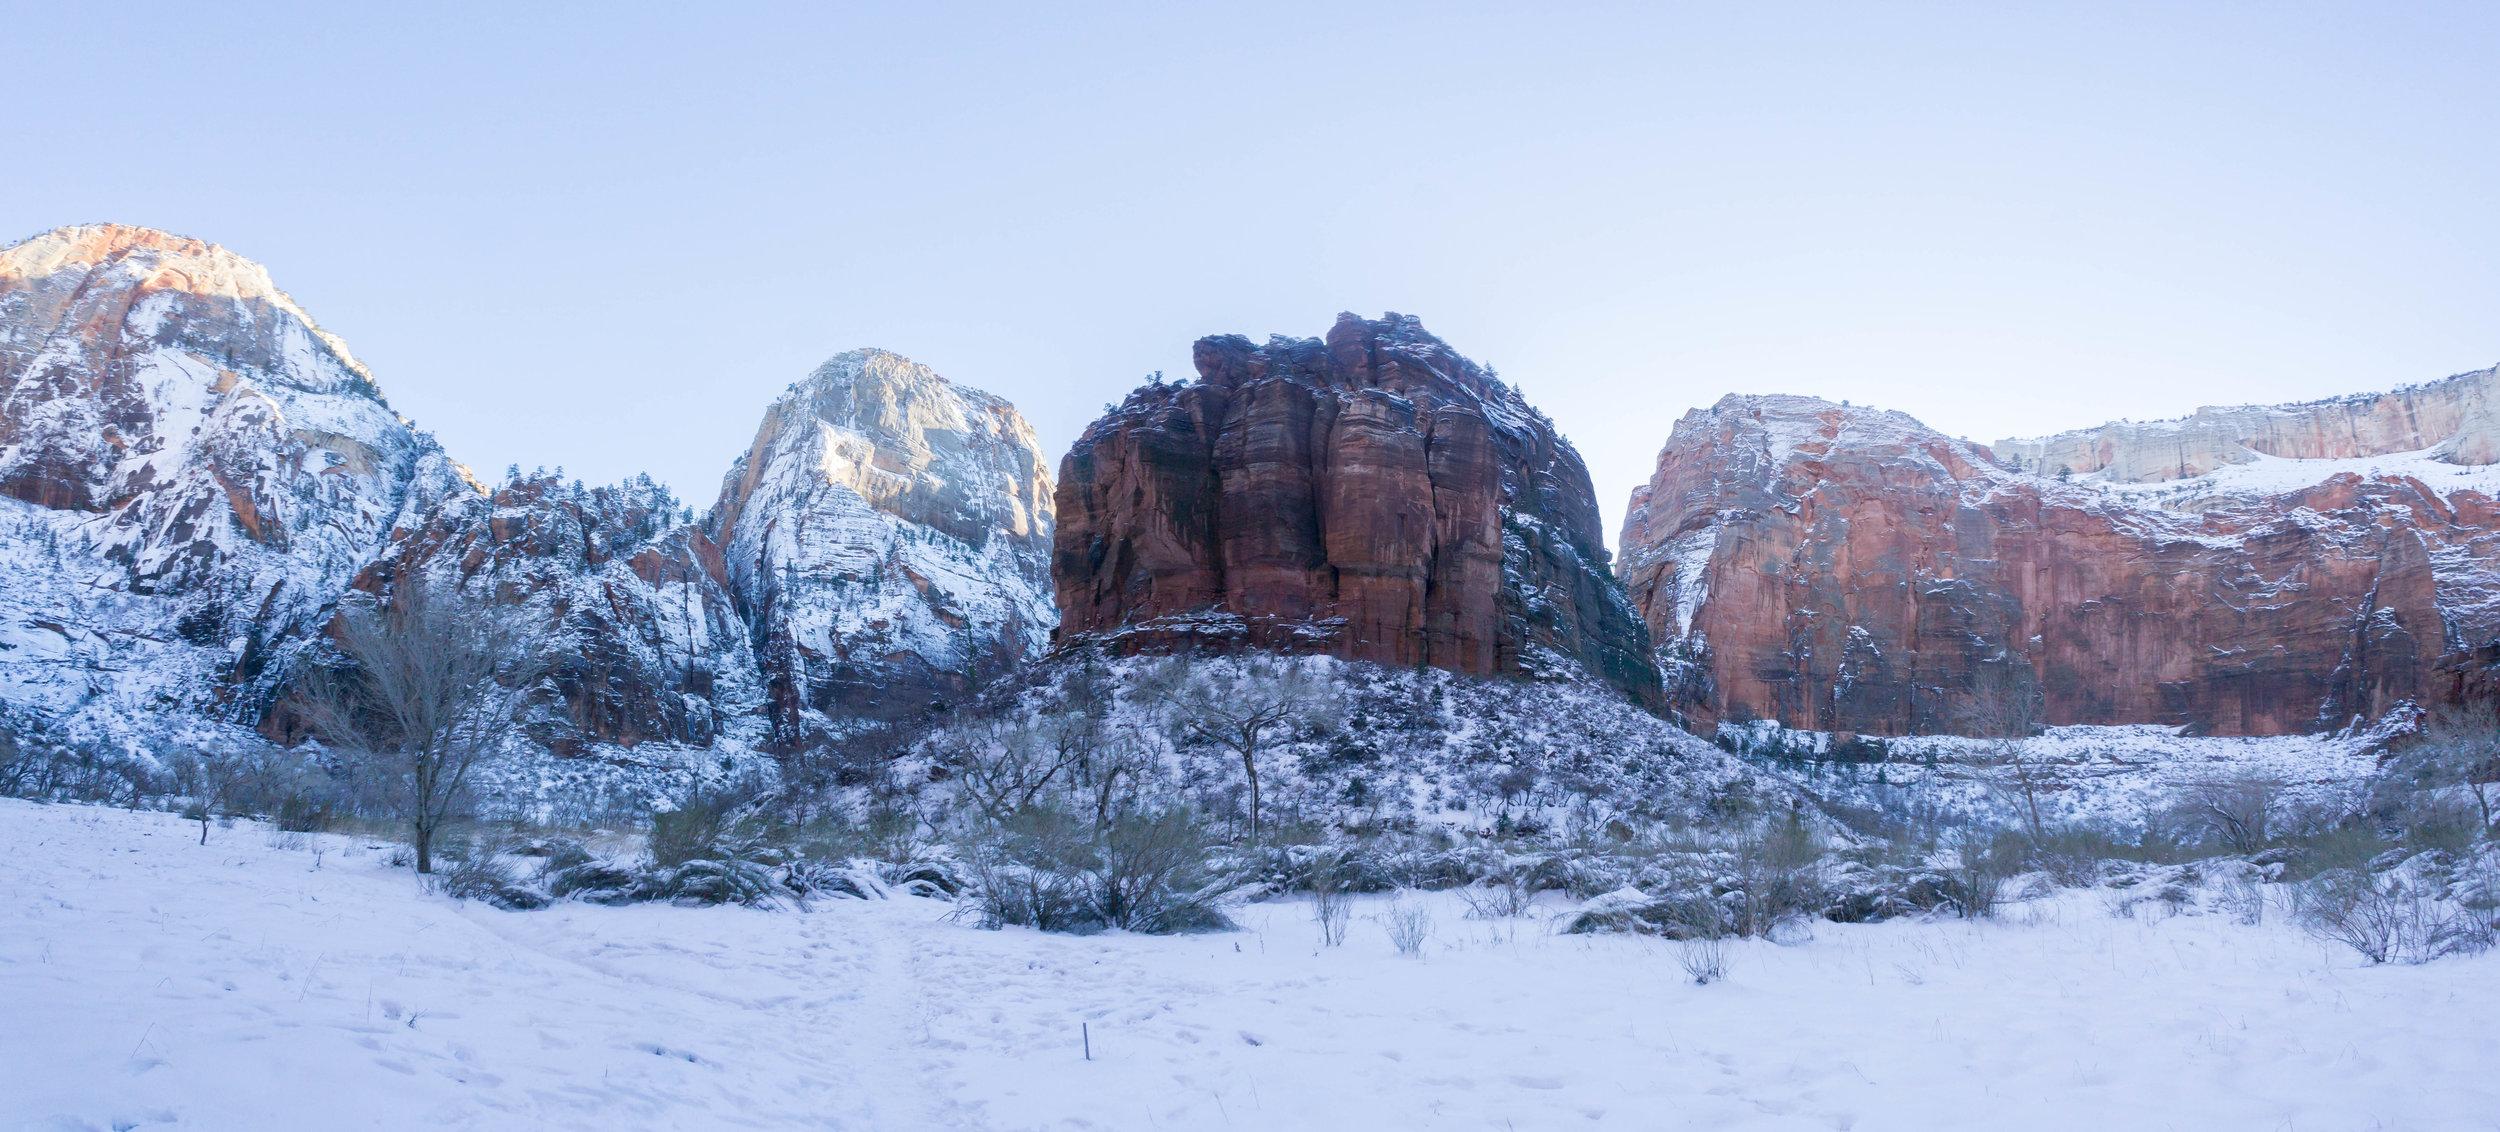 Big Bend - Zion National Park